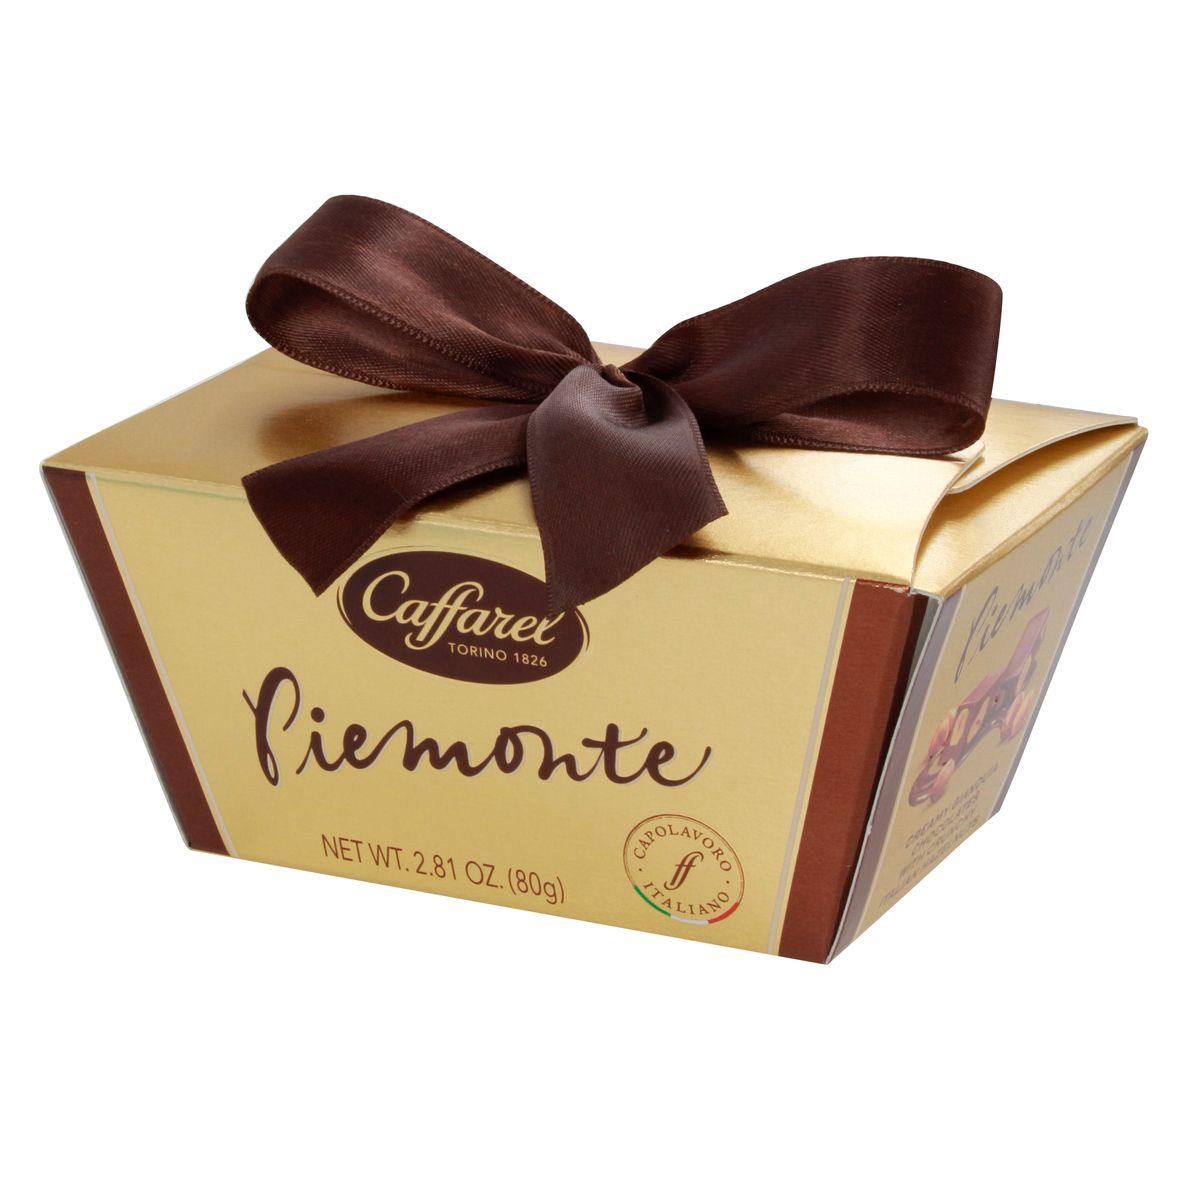 MINI BALLOTIN OR PIEMONTE 80G - CAFFAREL